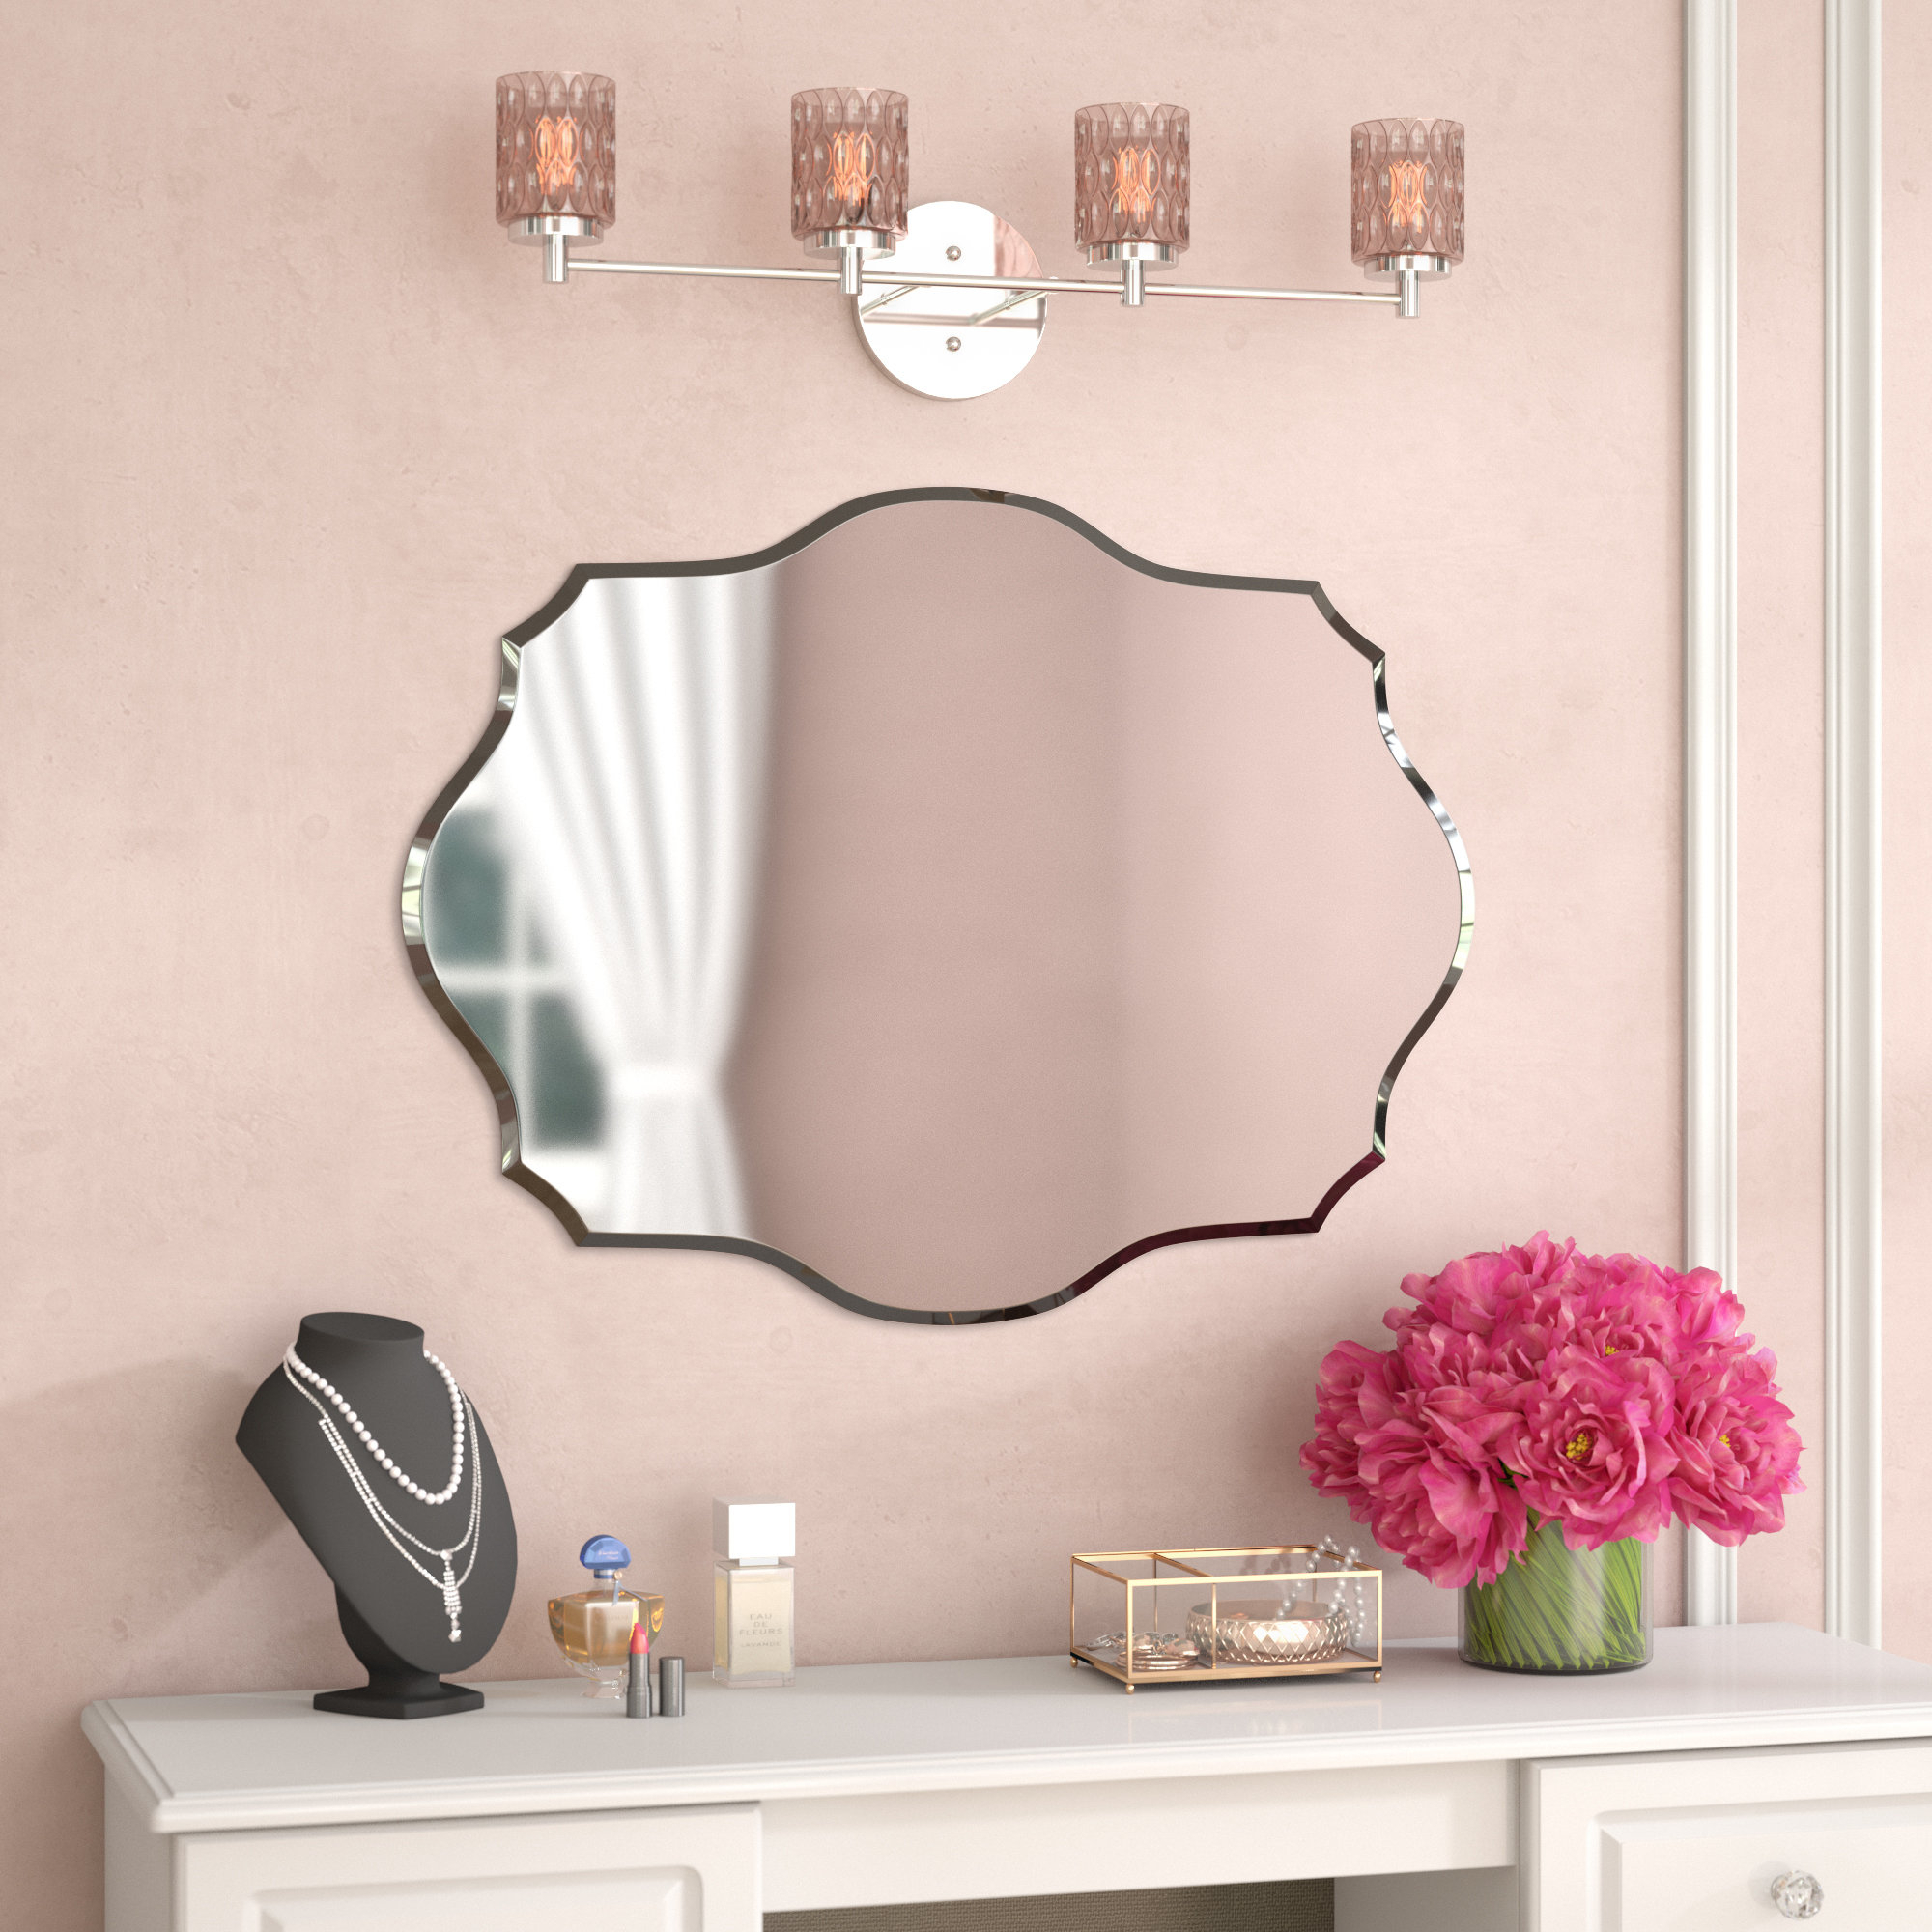 House Of Hampton Mccroy Glam Frameless Wall Mirror & Reviews in Estefania Frameless Wall Mirrors (Image 15 of 30)